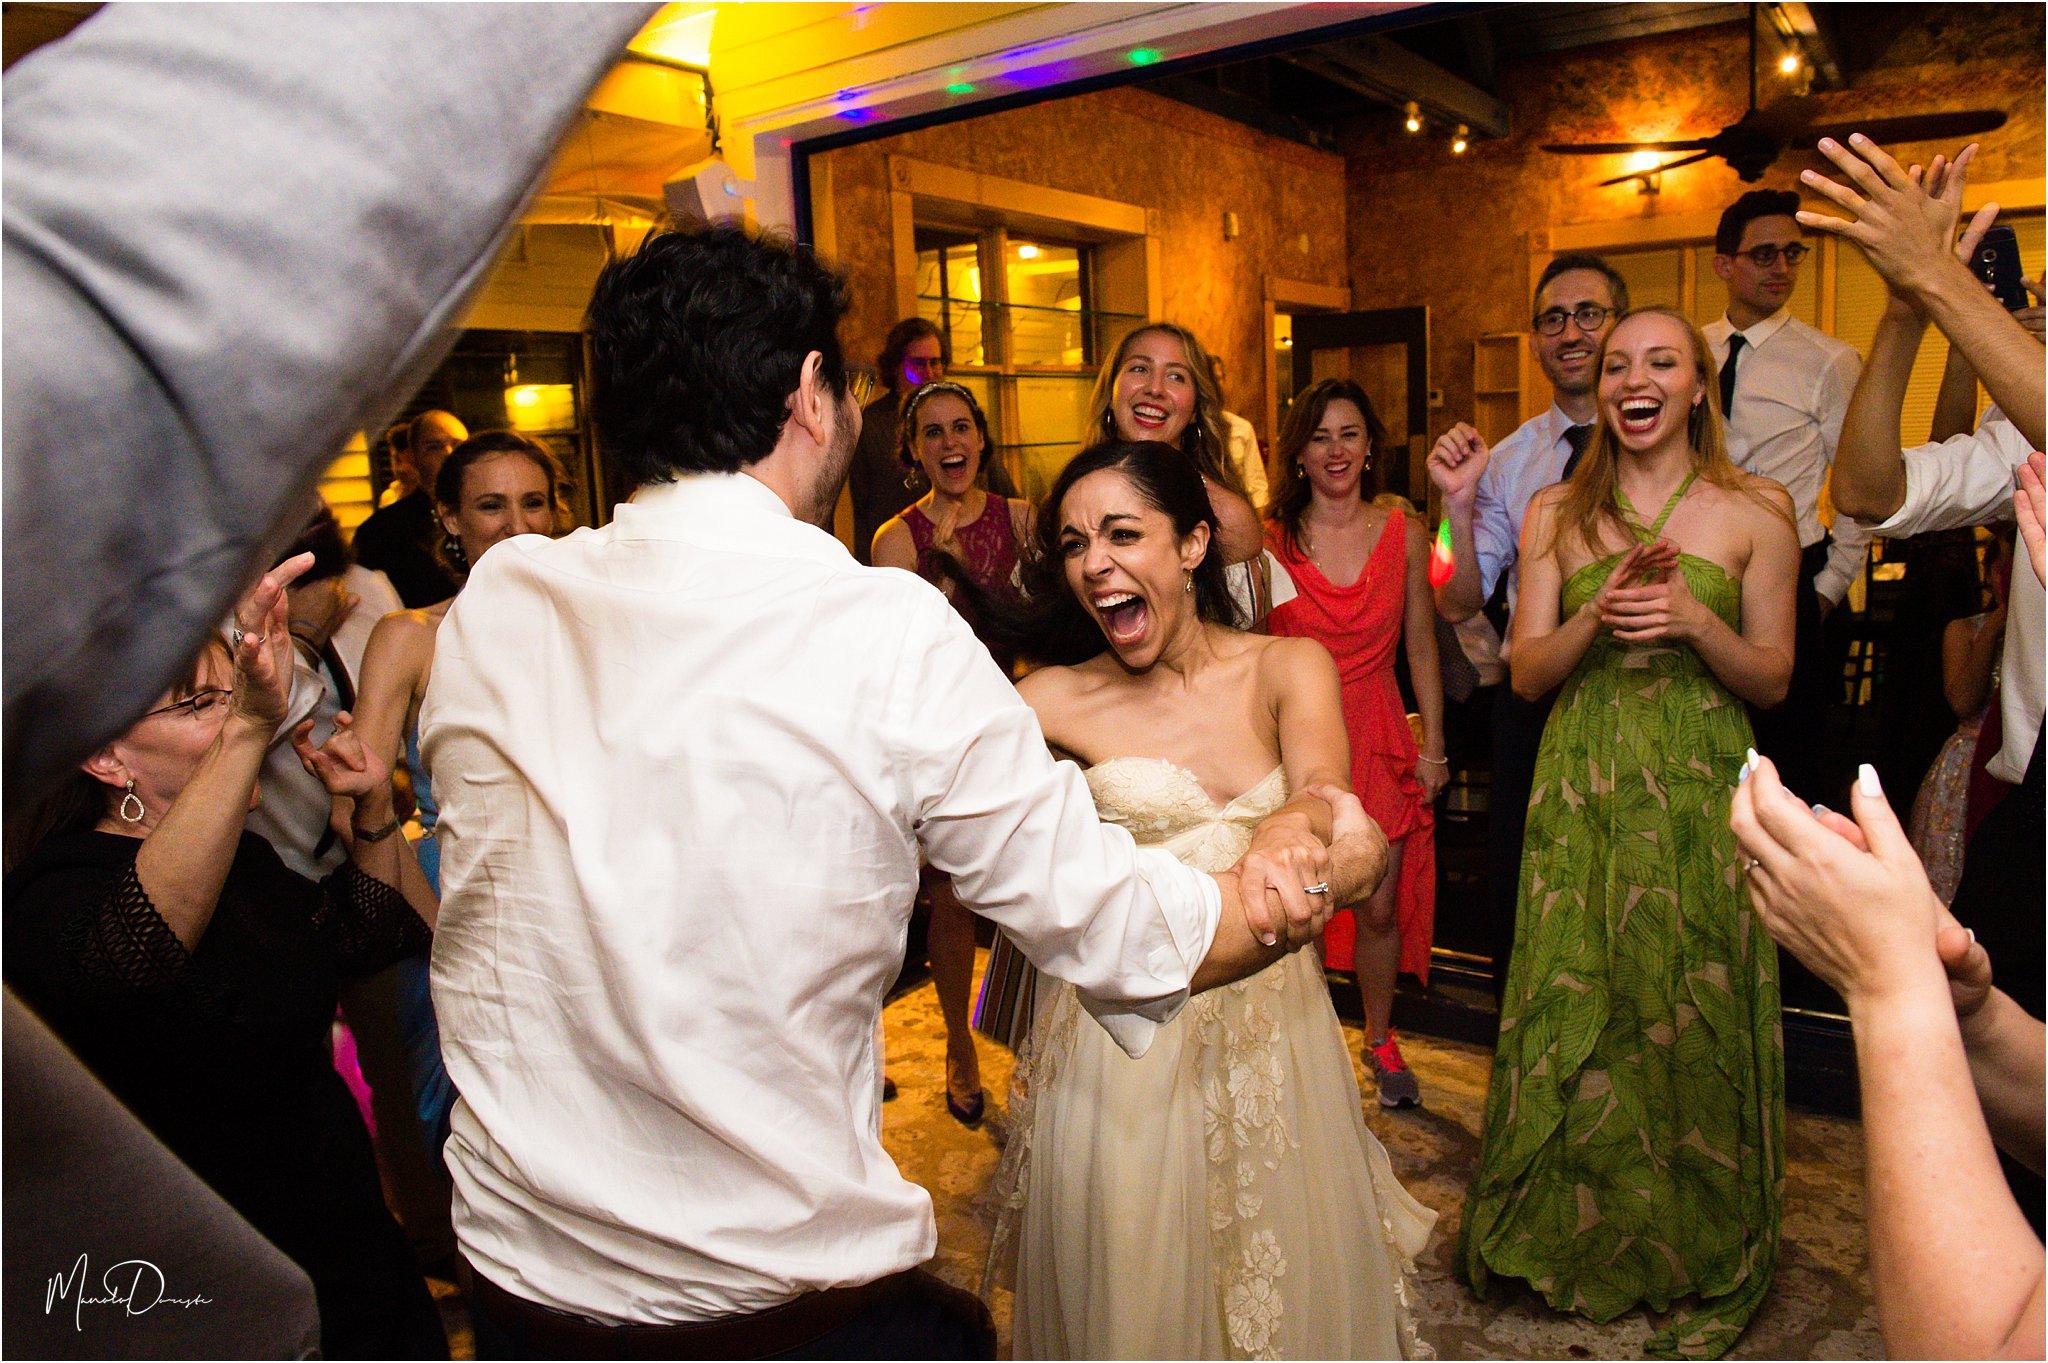 0527_ManoloDoreste_InFocusStudios_Wedding_Family_Photography_Miami_MiamiPhotographer.jpg